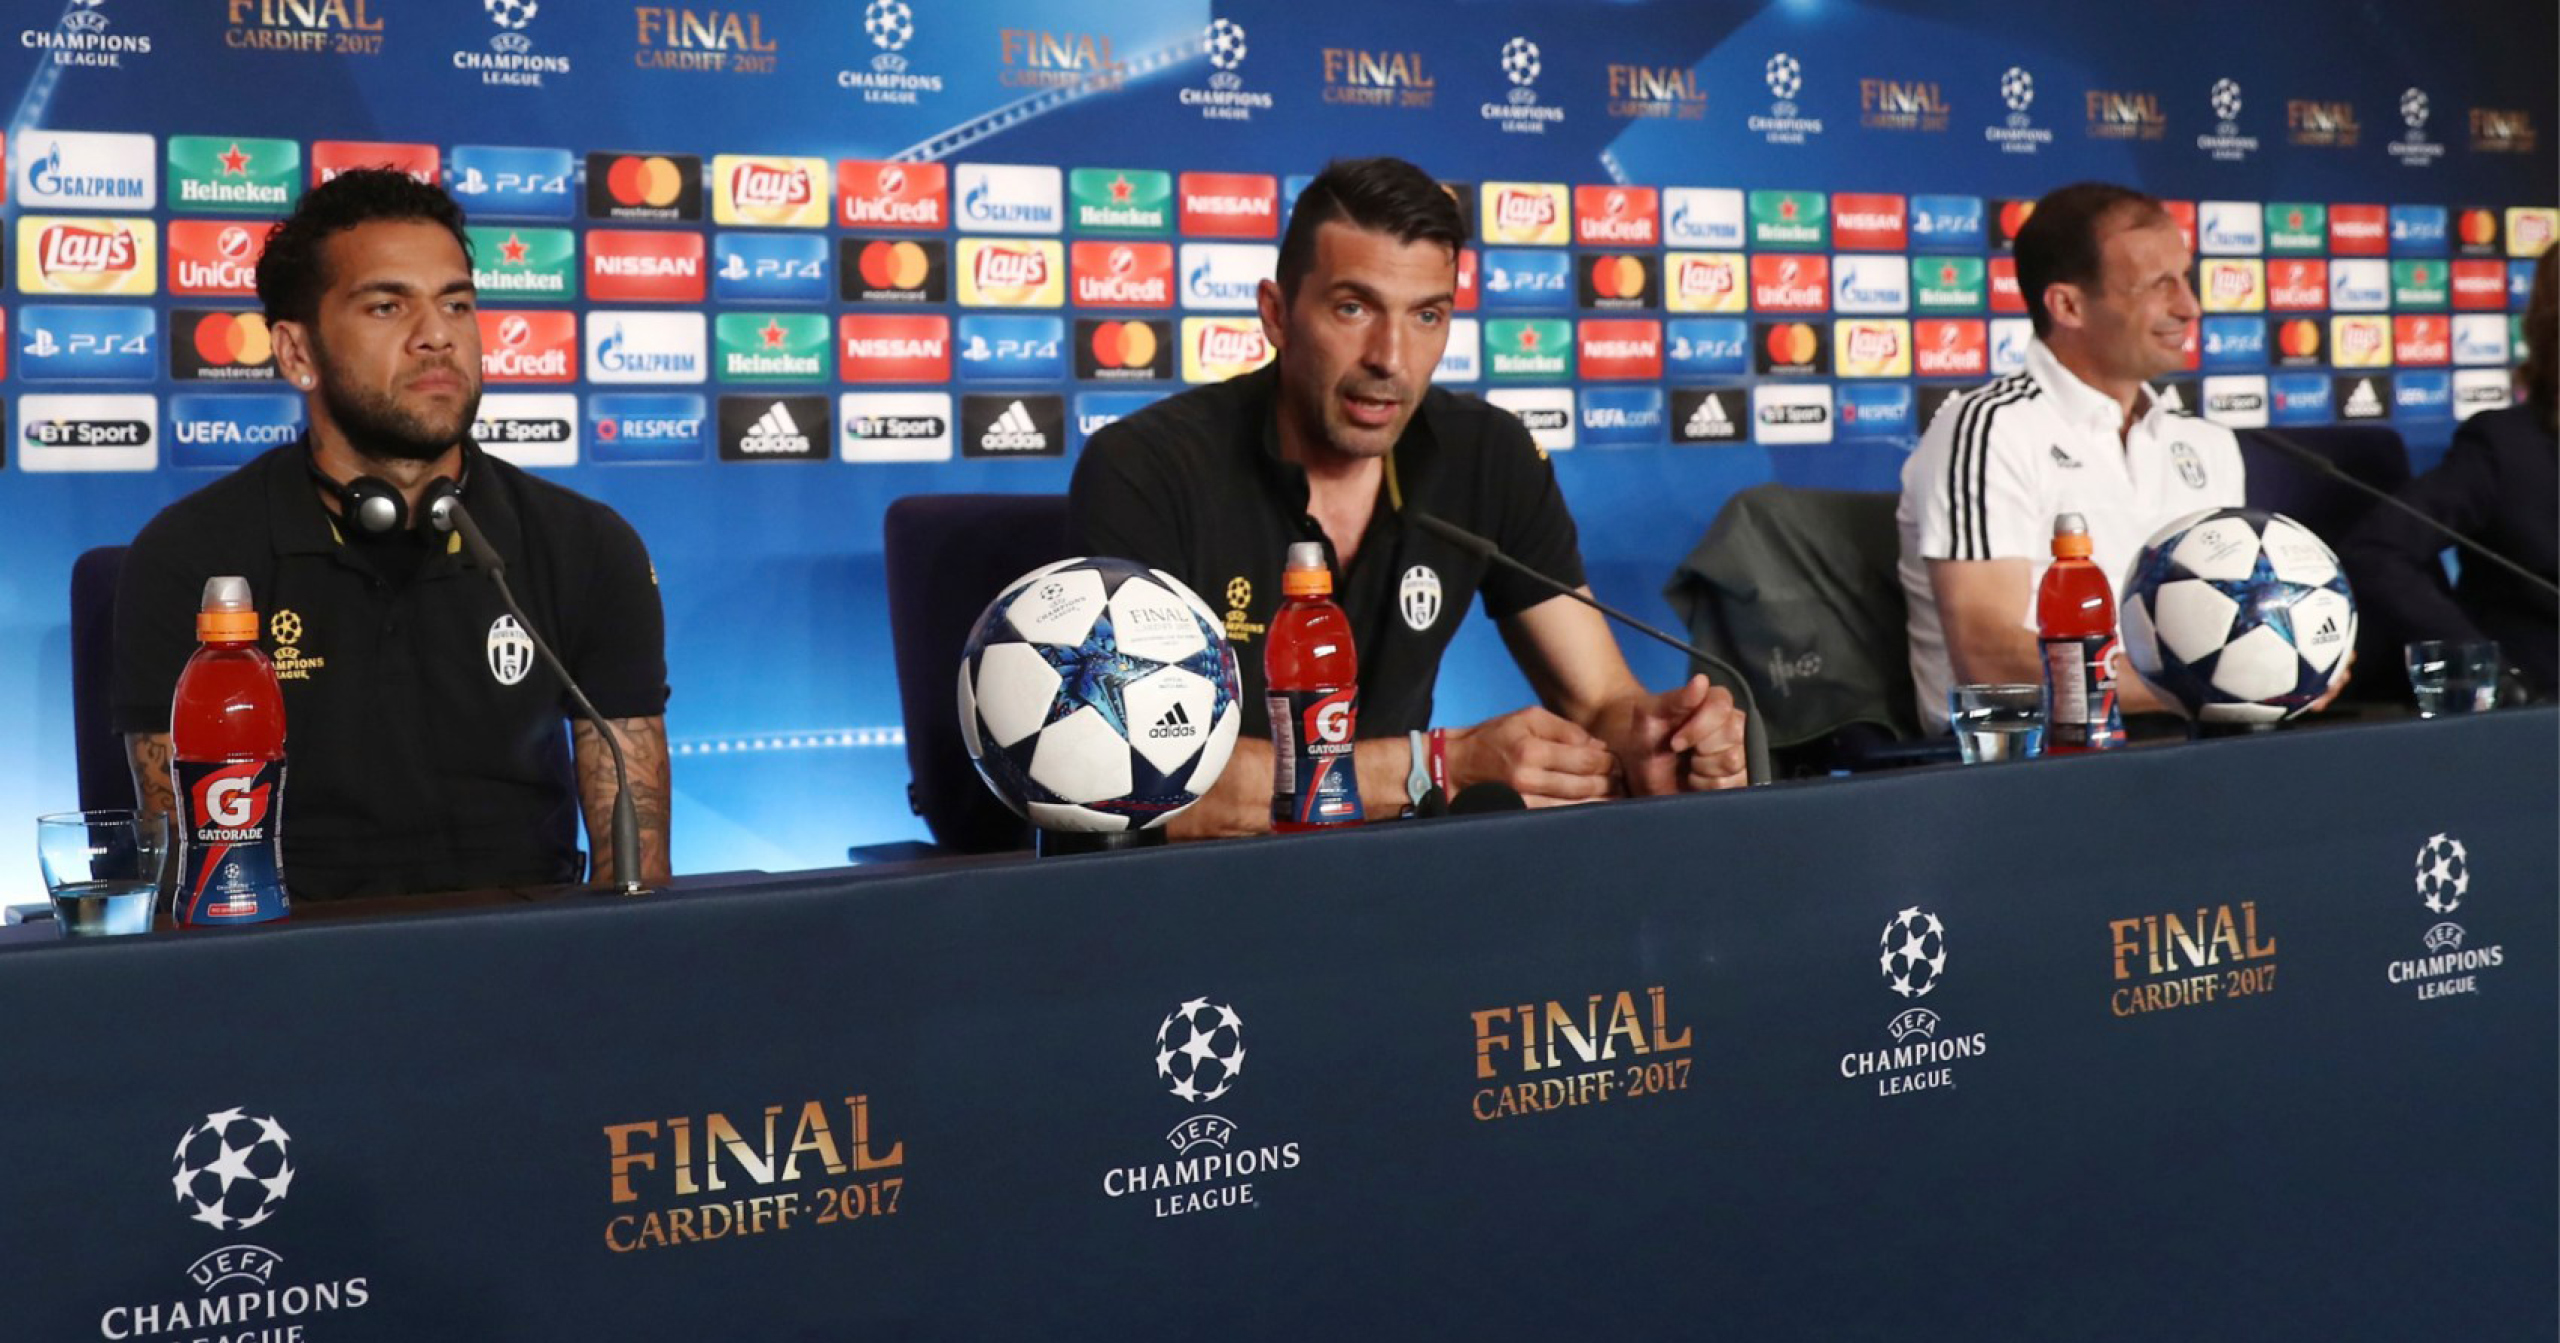 Wrightio_Champions League Final 2017_Press